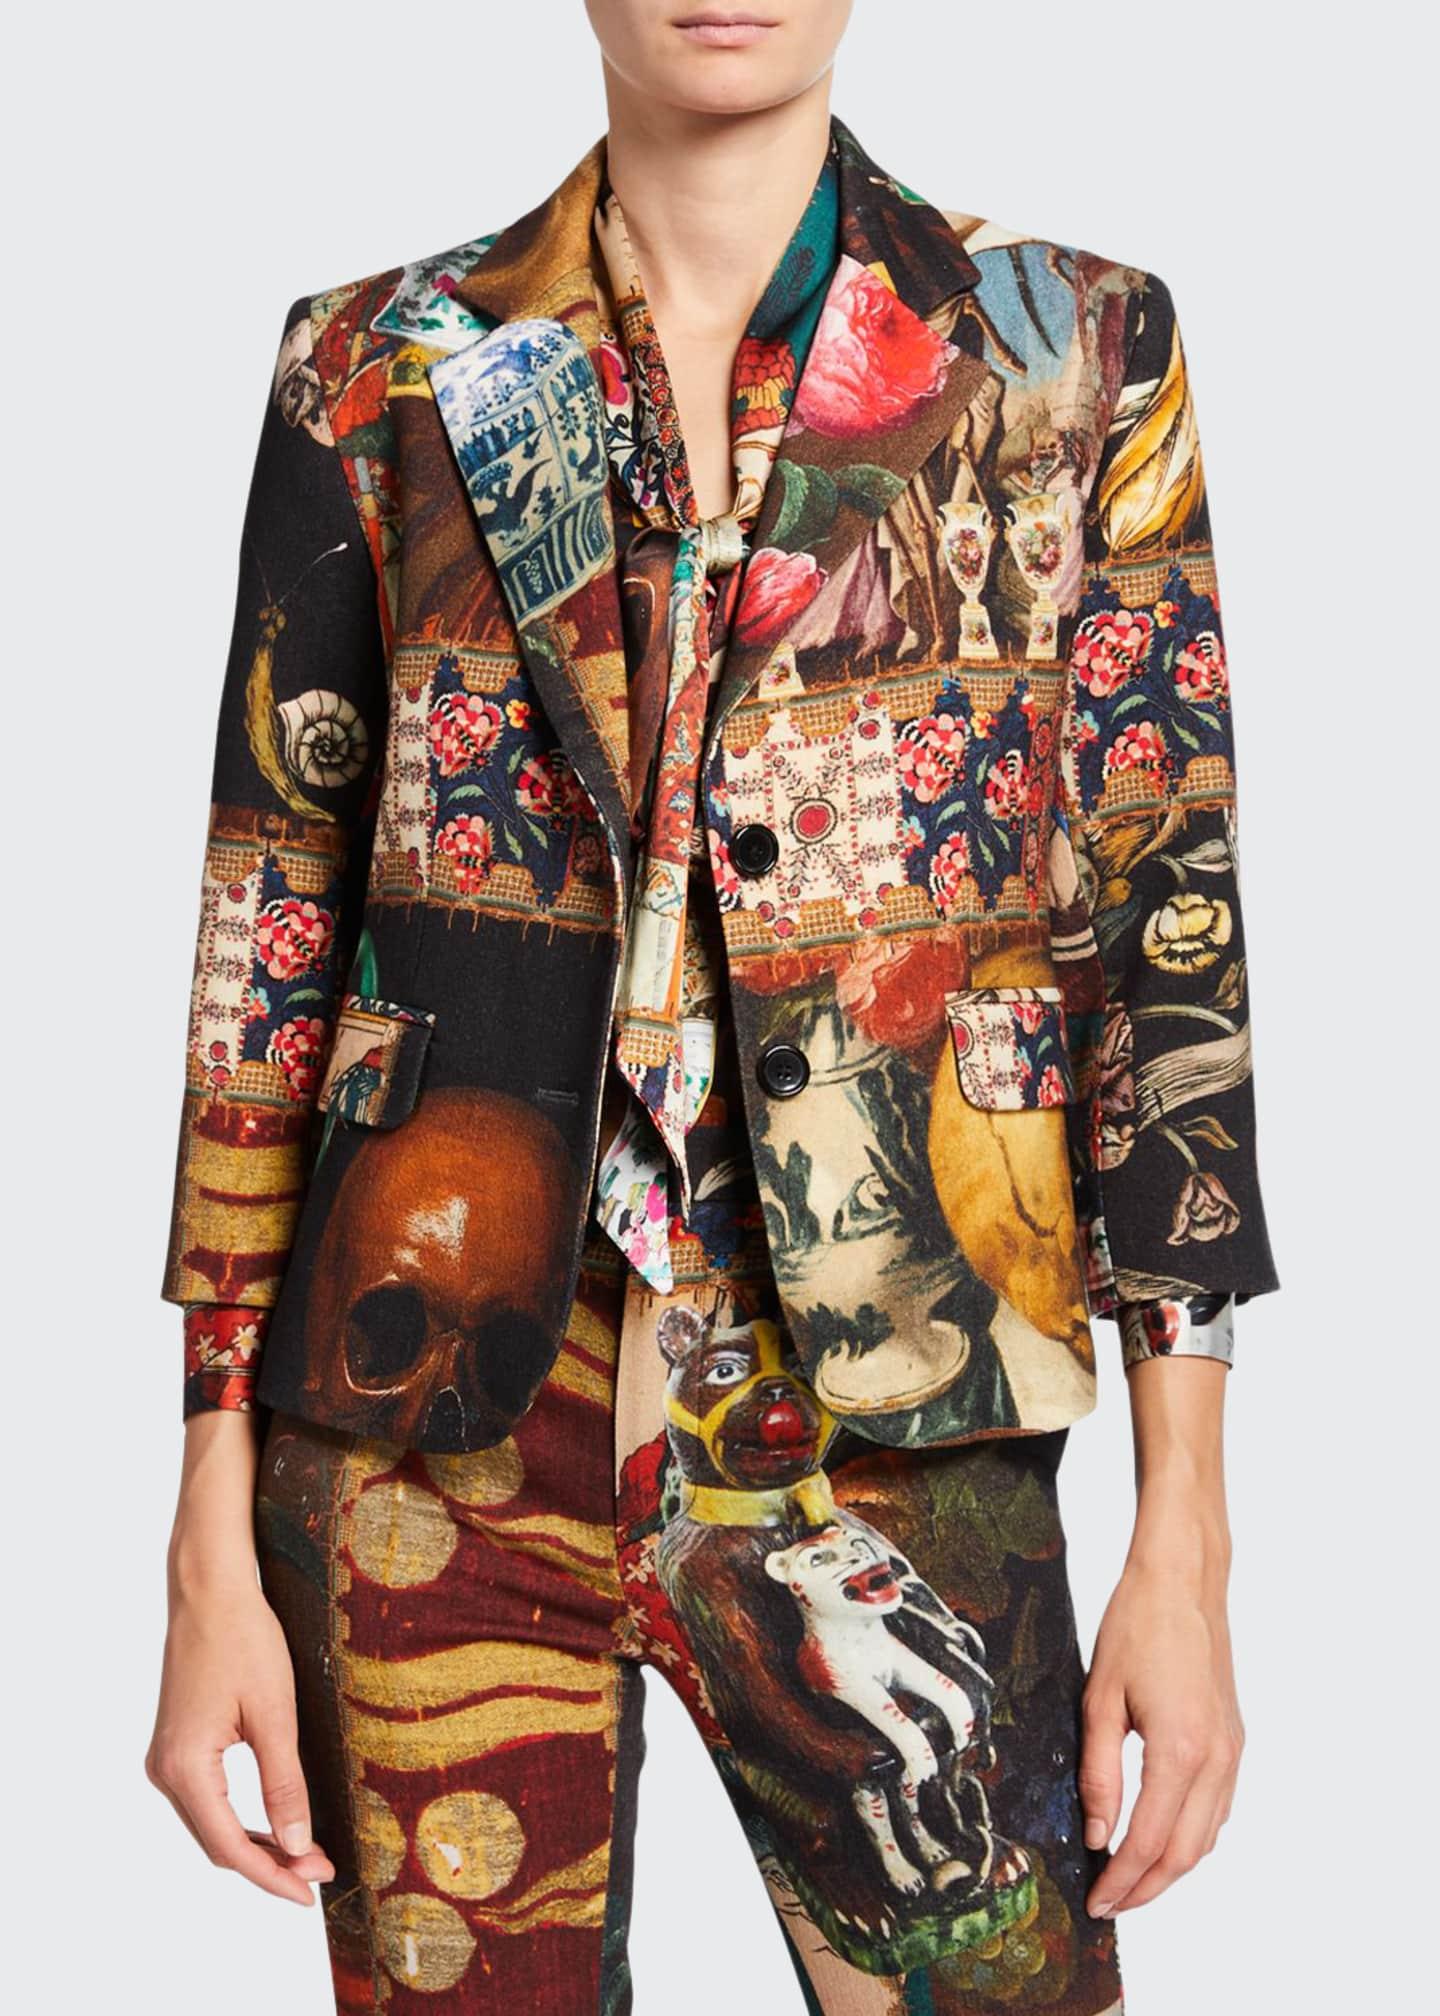 Libertine Memento Mori Mixed Media Two-Button Wool Blazer